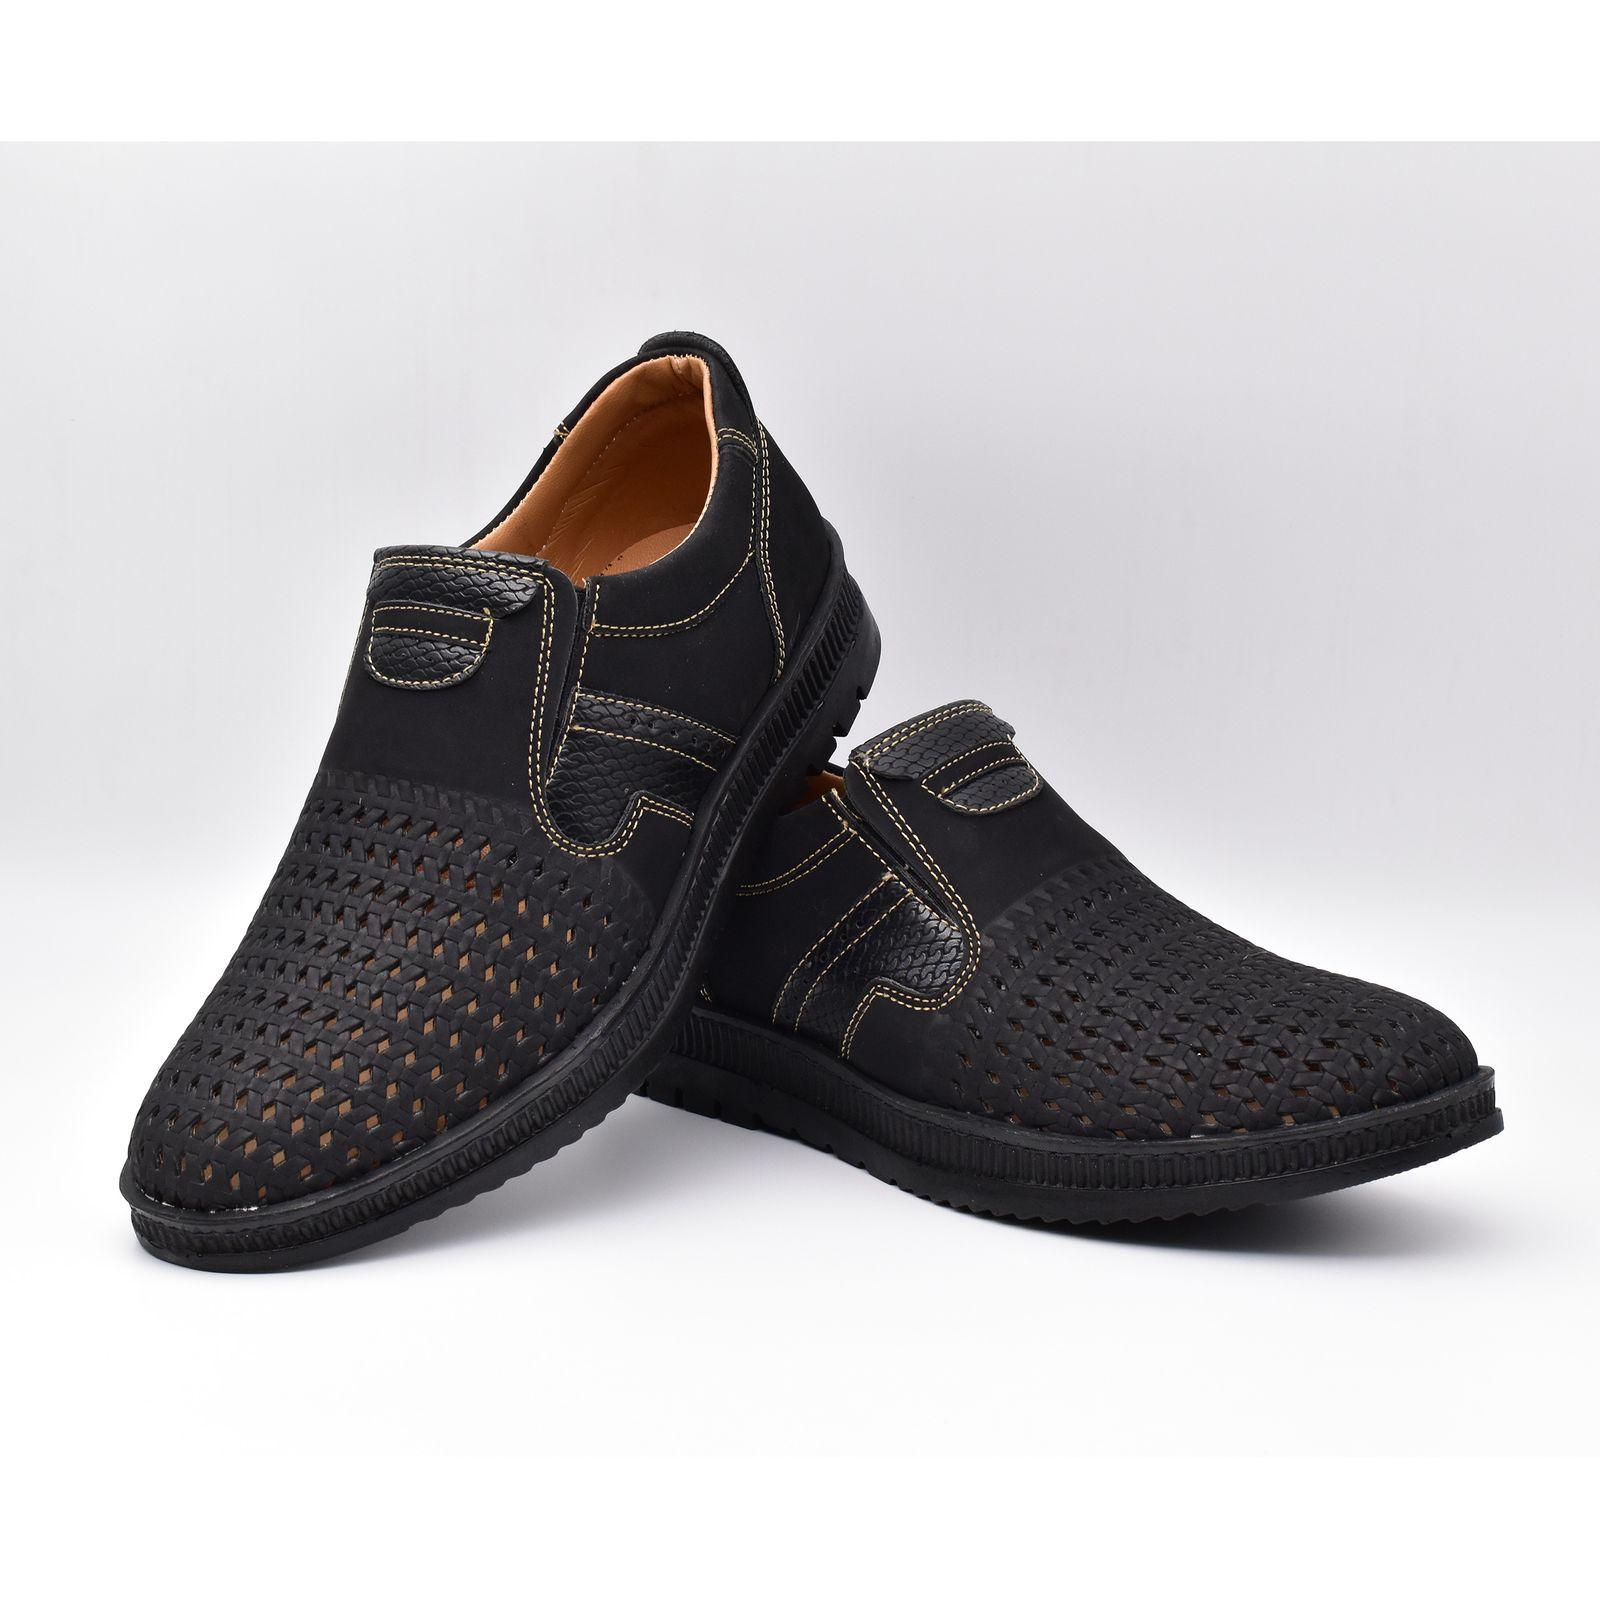 کفش روزمره مردانه مدل گلف کد 7014 -  - 6